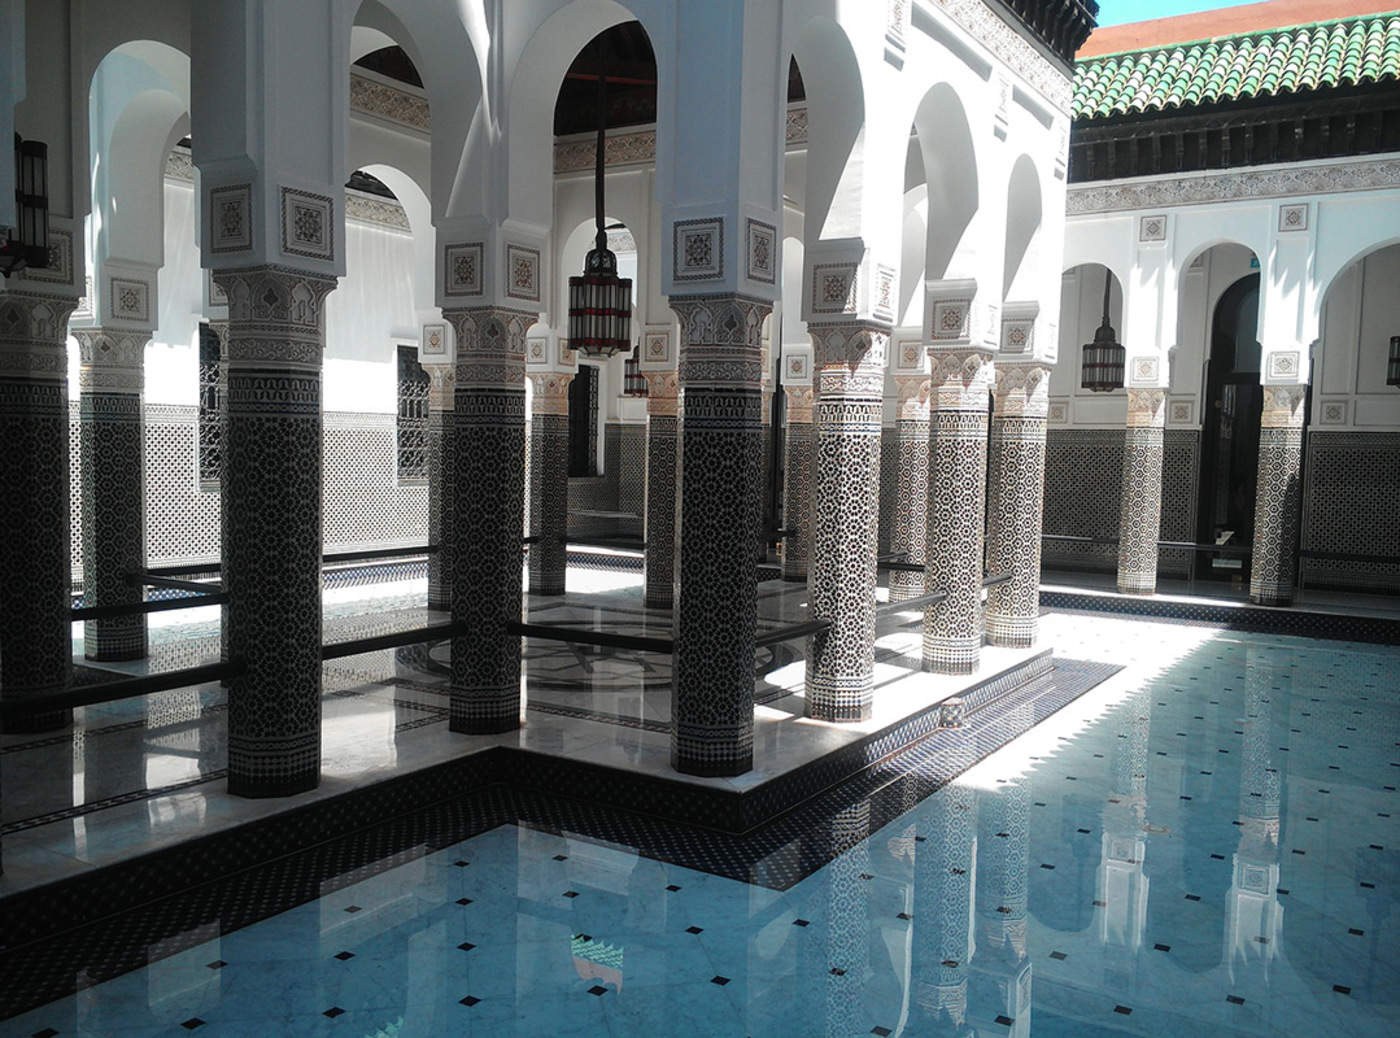 morocco-1542831_1920